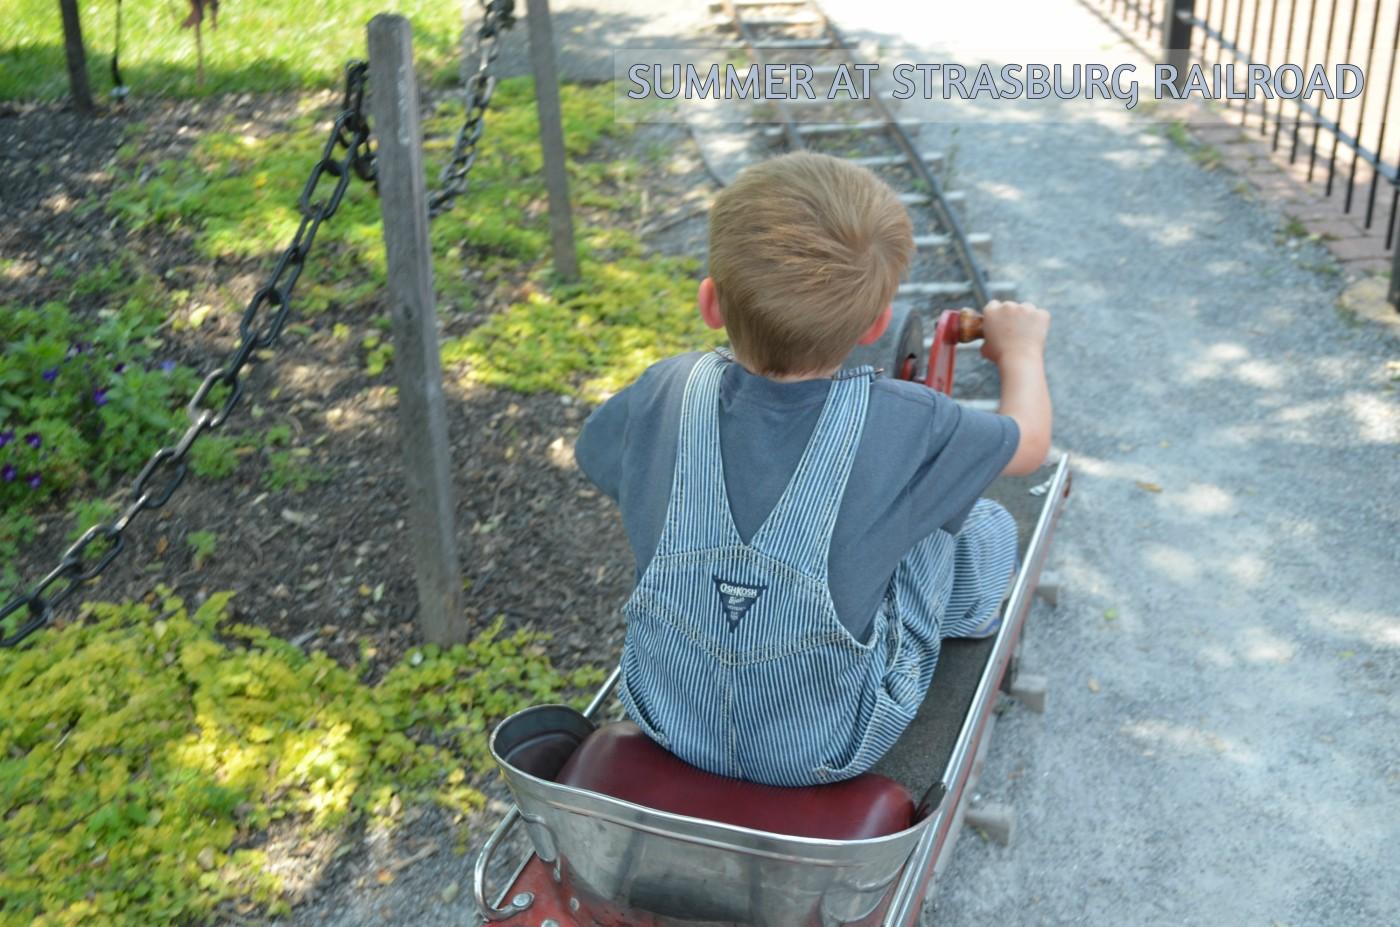 full steam ahead to a summer of fun at strasburg railroad u2013 the